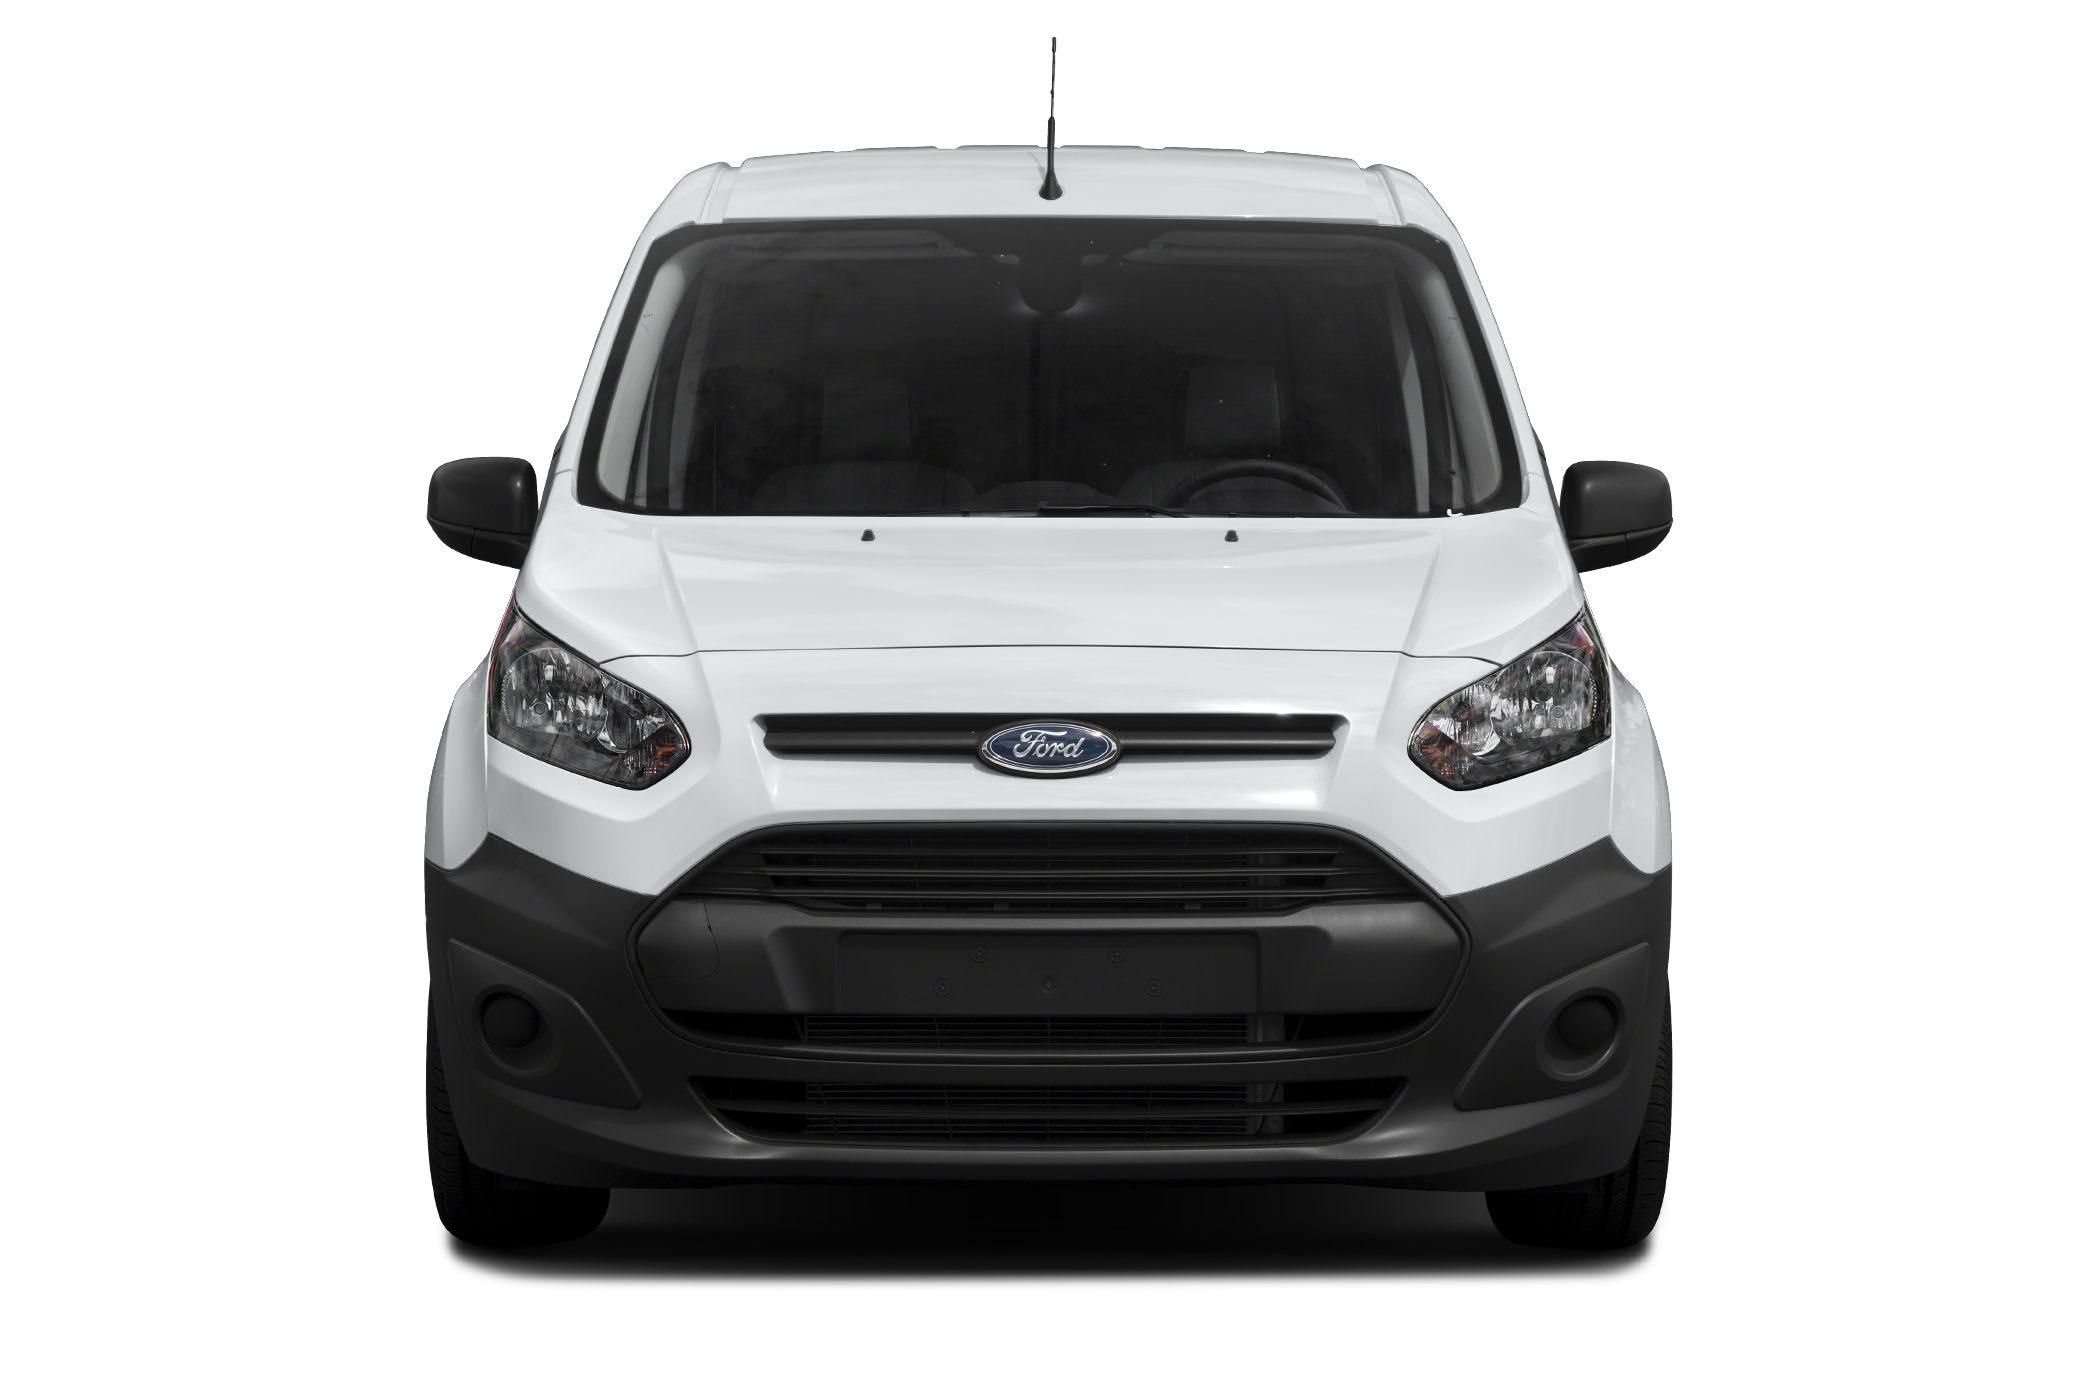 2017 ford transit connect xlt cars and vehicles burlington nc. Black Bedroom Furniture Sets. Home Design Ideas